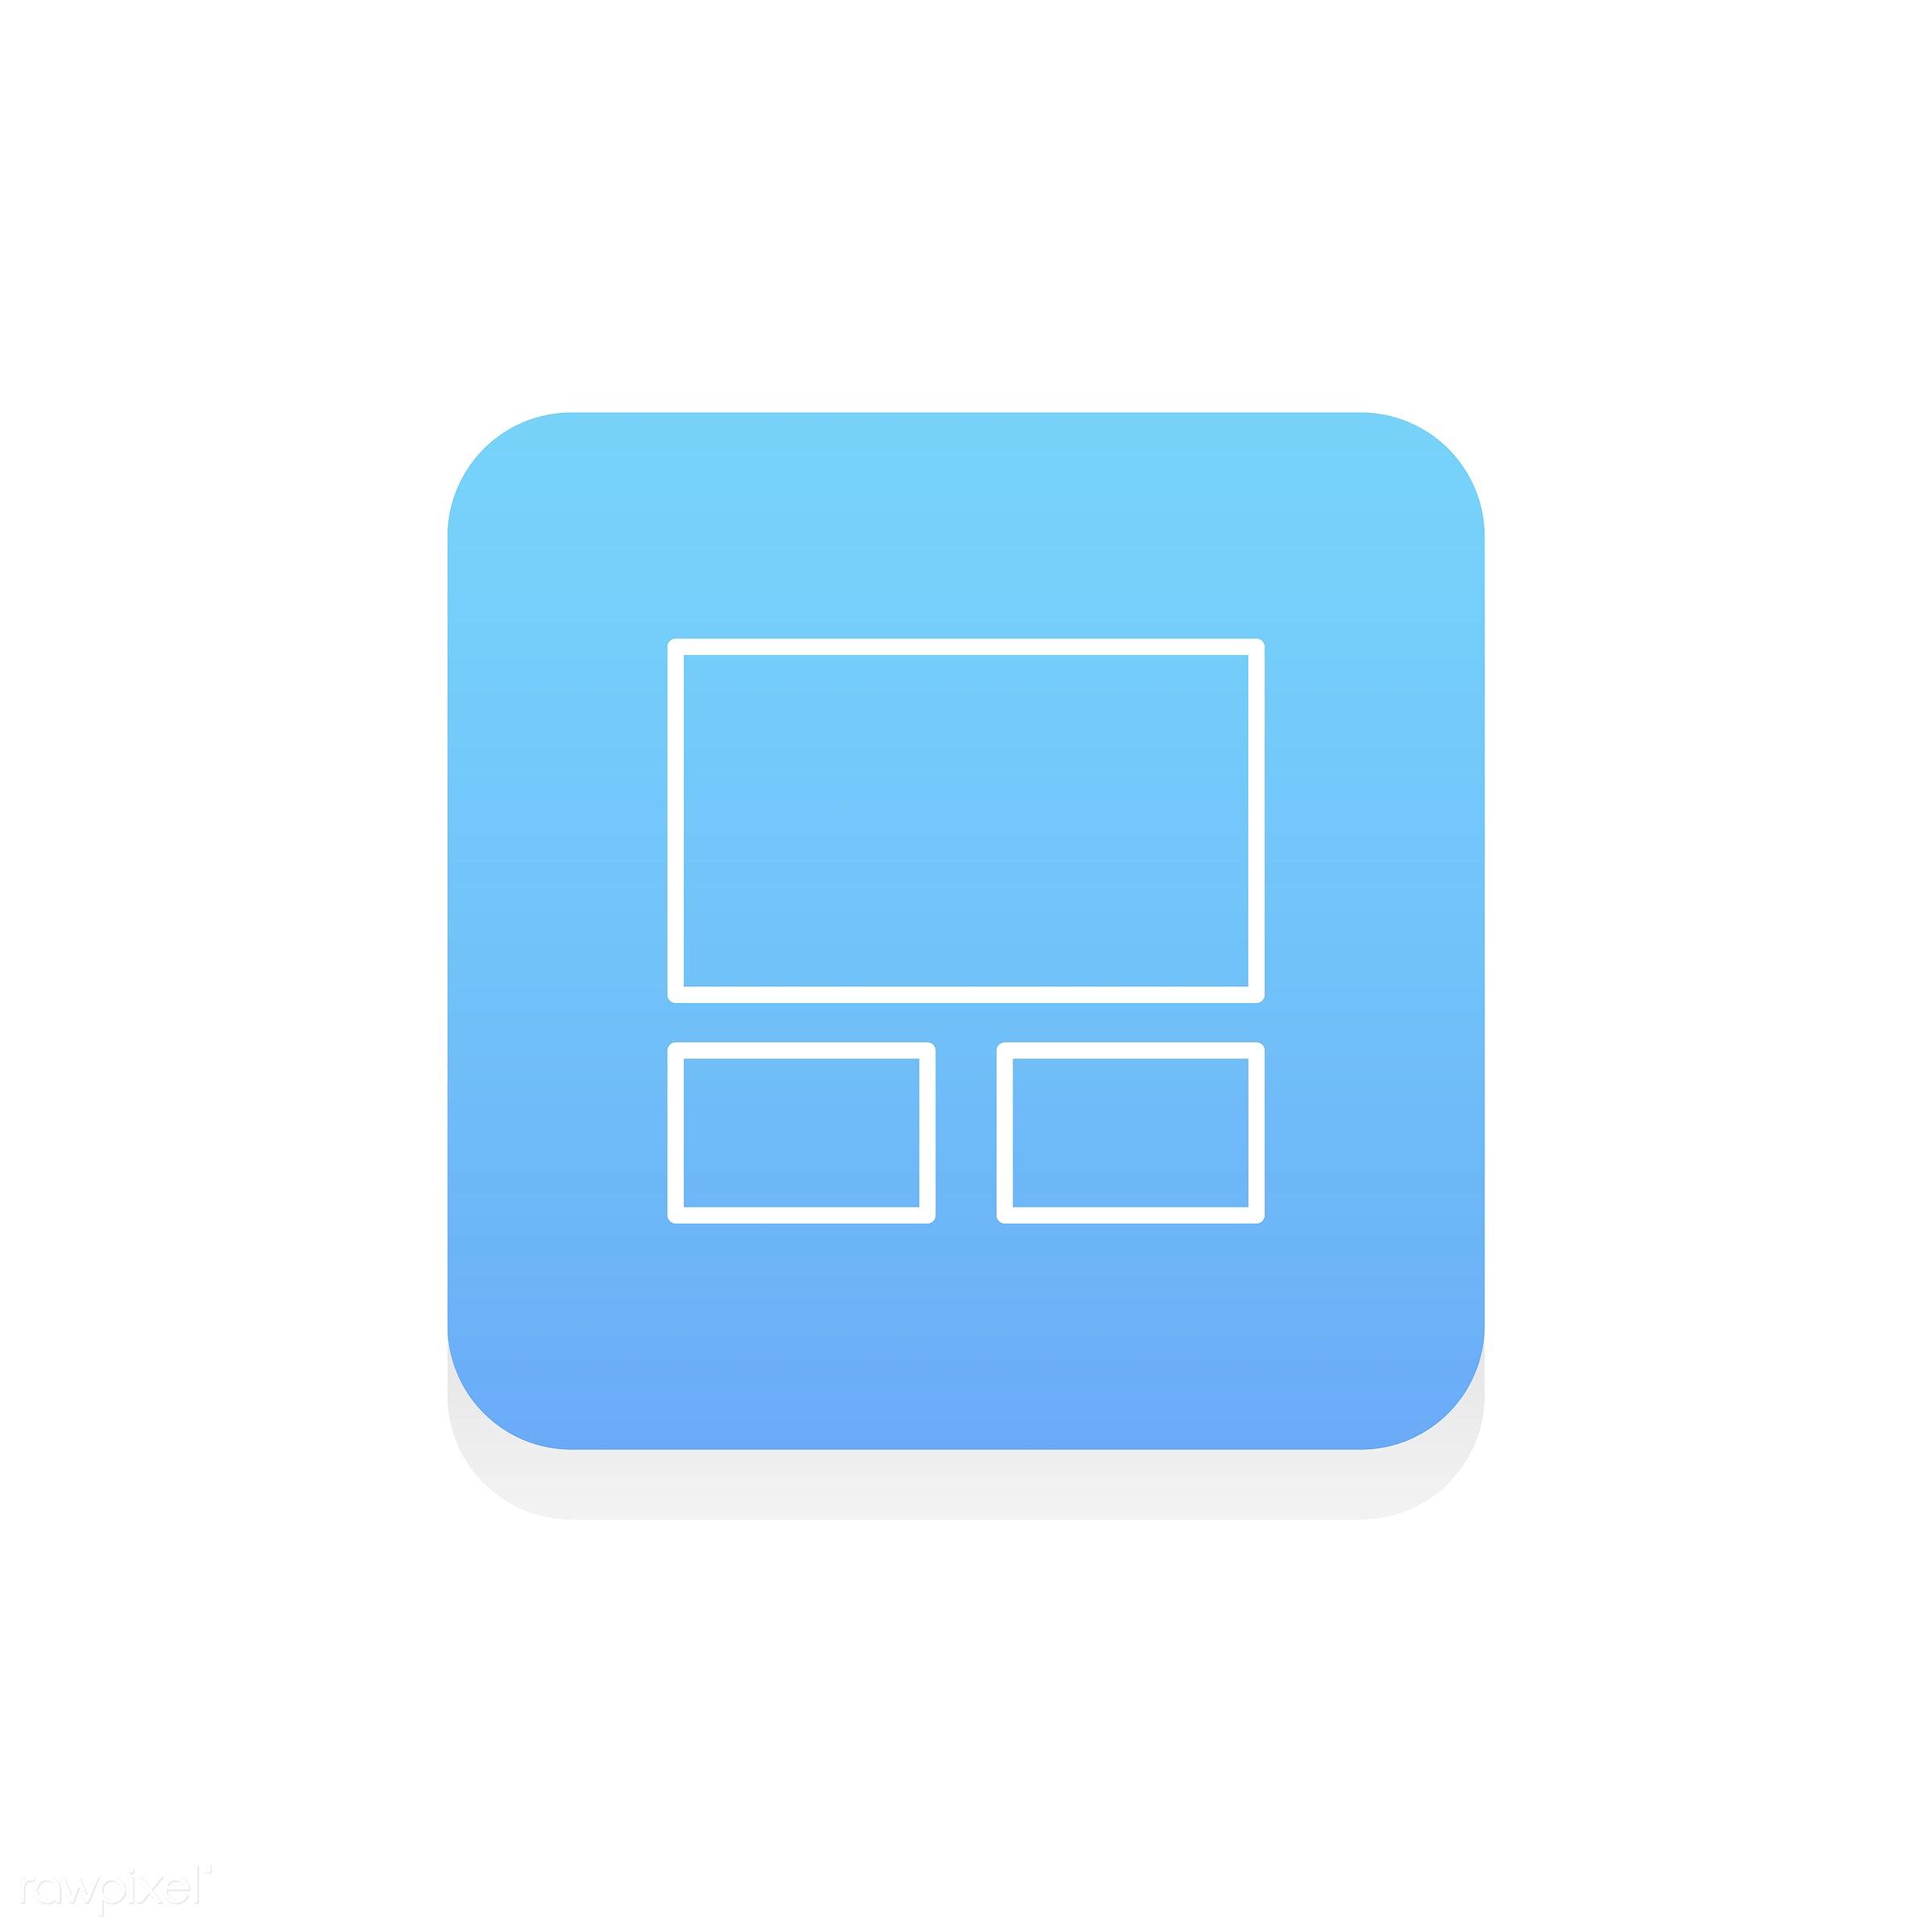 Vector of design edit icon - align, alignment, design, edit, flat, graphic, icon, illustration, isolated, layout, platform,...